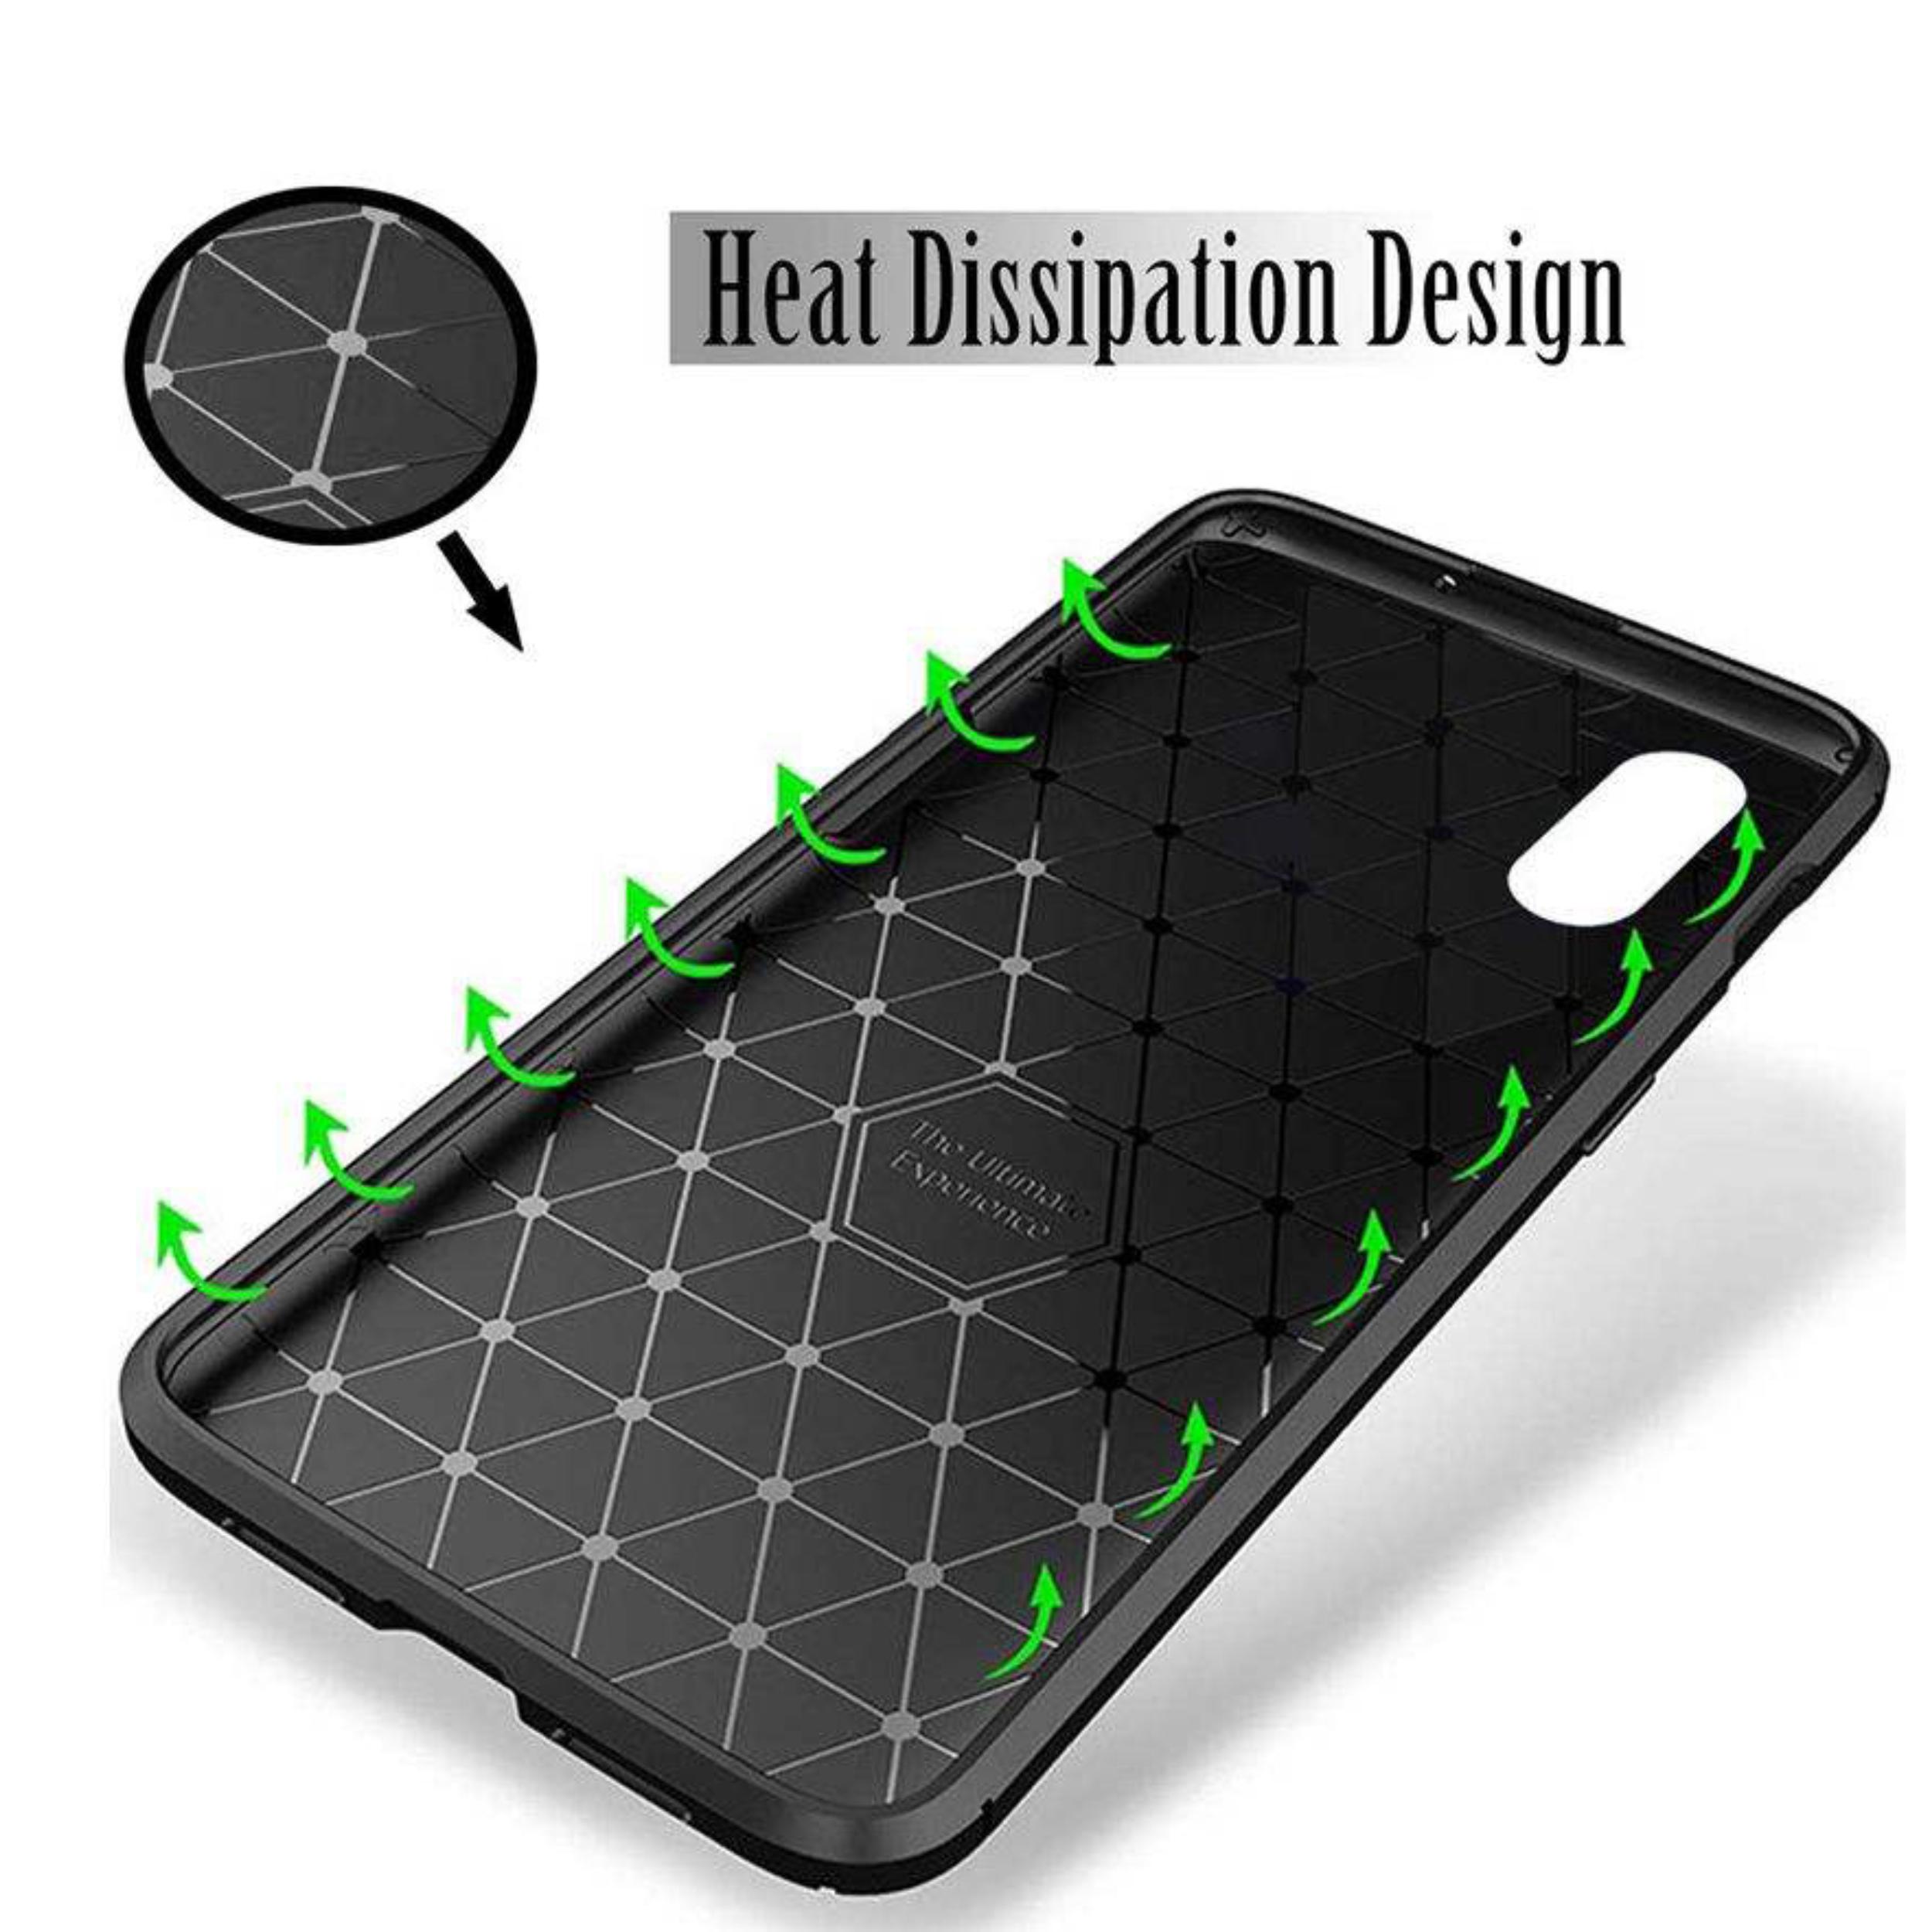 کاور لاین کینگ مدل A21 مناسب برای گوشی موبایل سامسونگ Galaxy A70/ A70S thumb 2 11